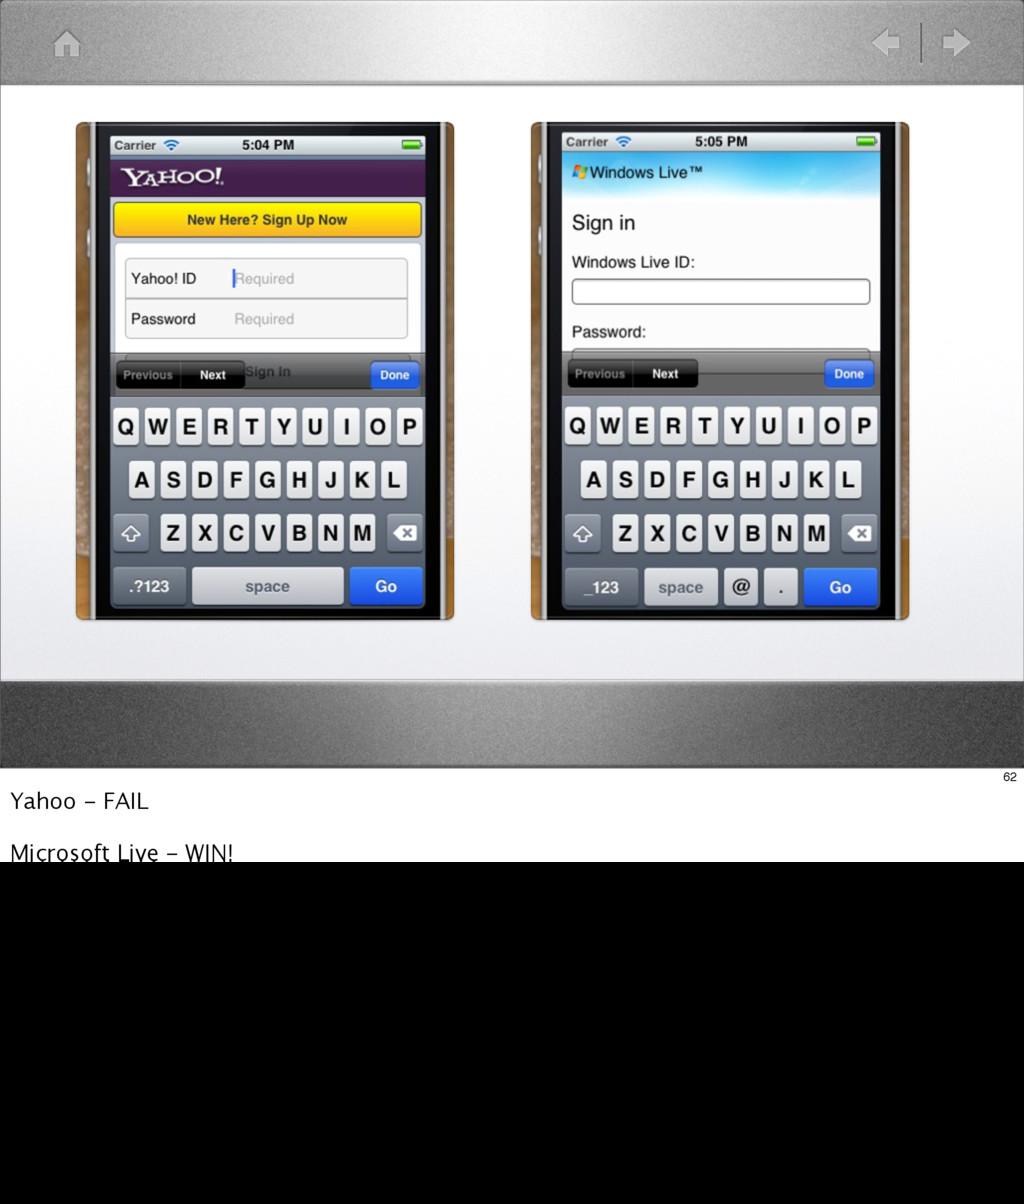 62 Yahoo - FAIL Microsoft Live - WIN!